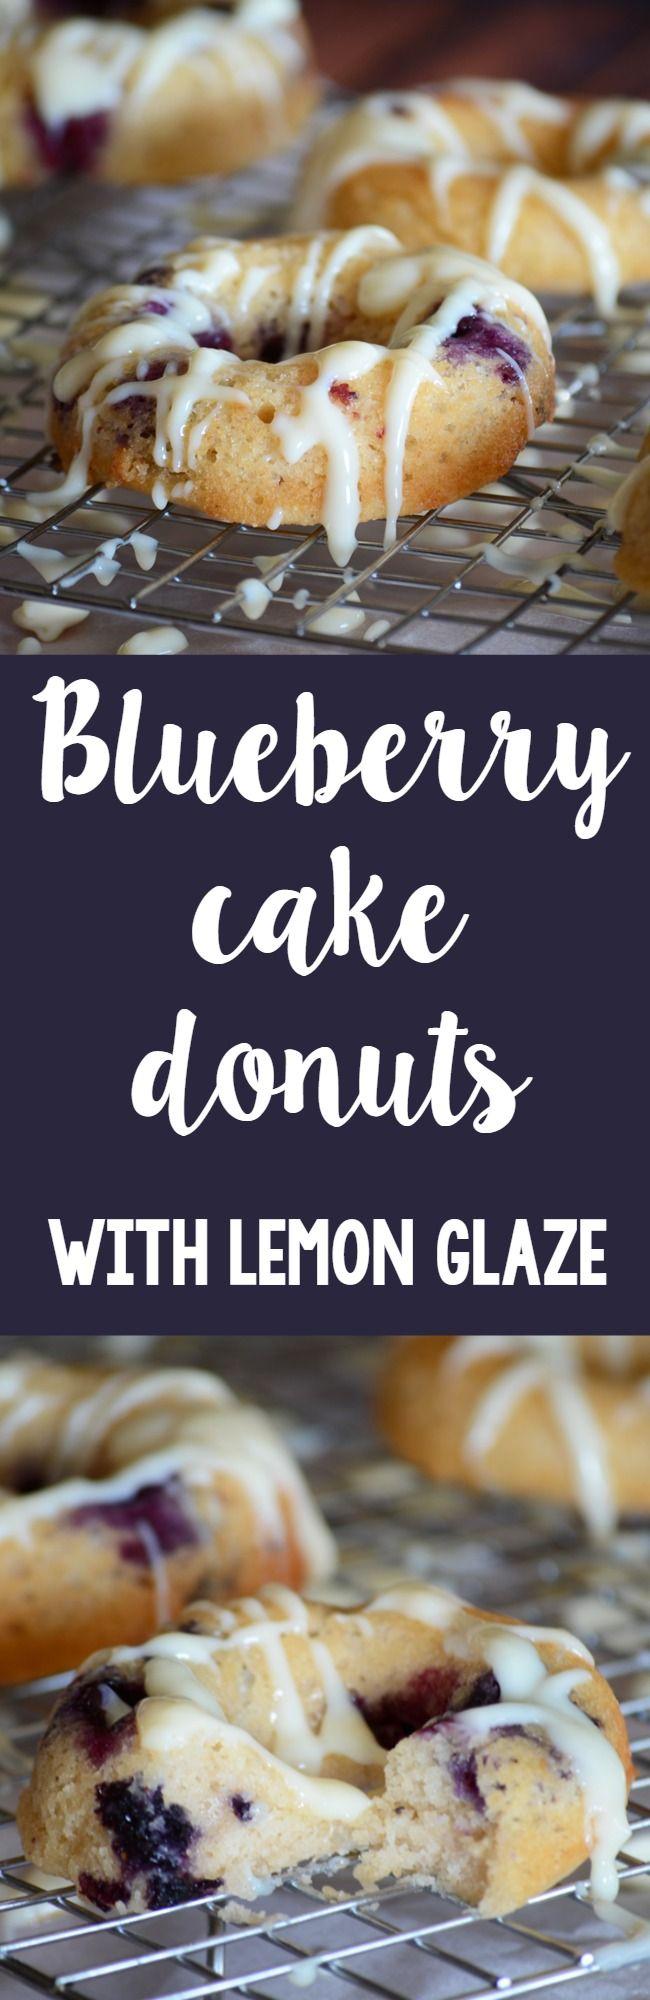 Blueberry cake donuts with lemon glaze